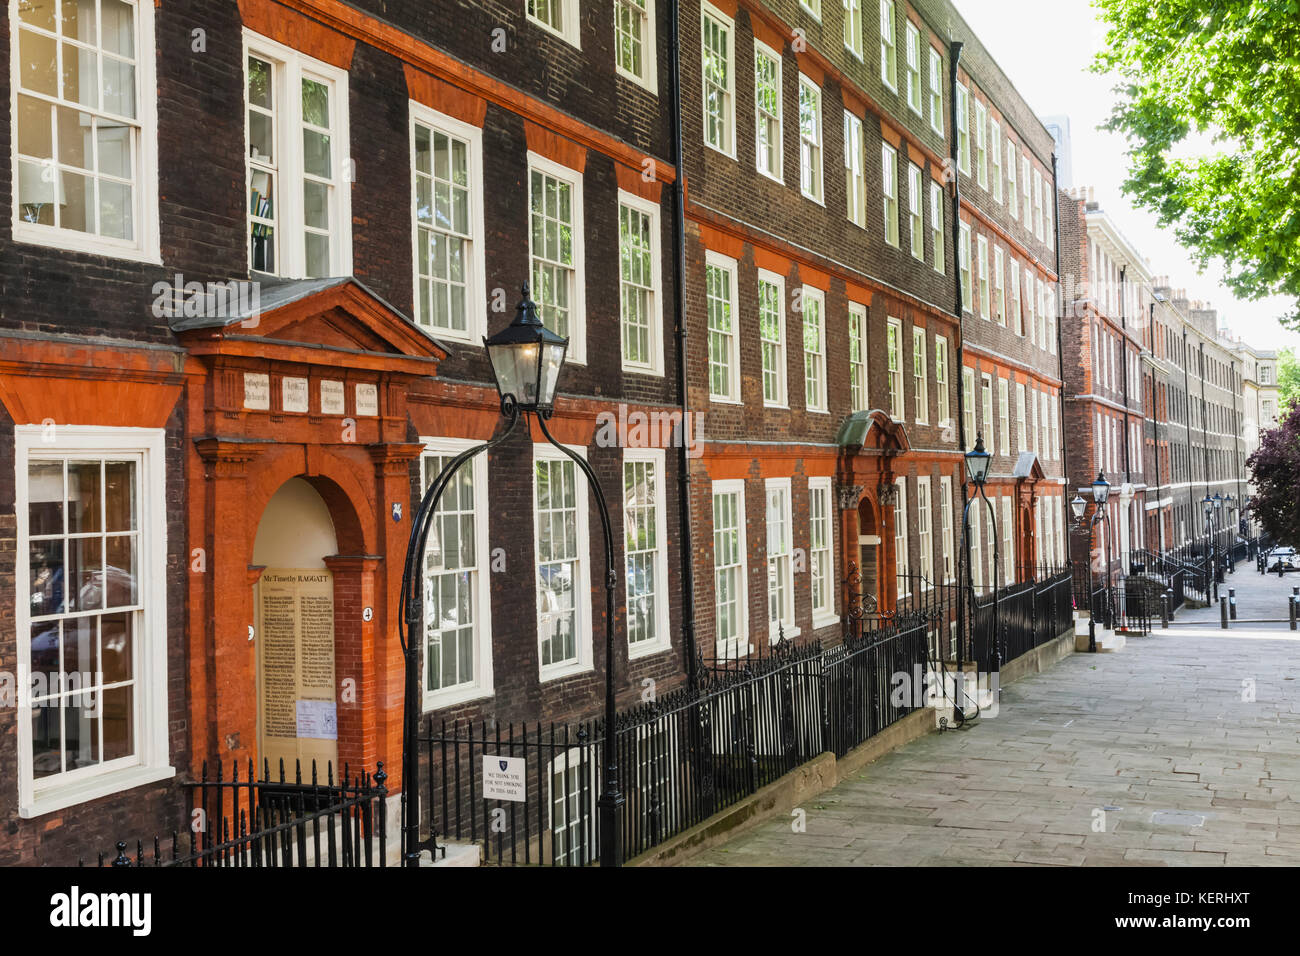 England, London, City of London, Inns of Court, Inner Temple, King's Bench Walk - Stock Image